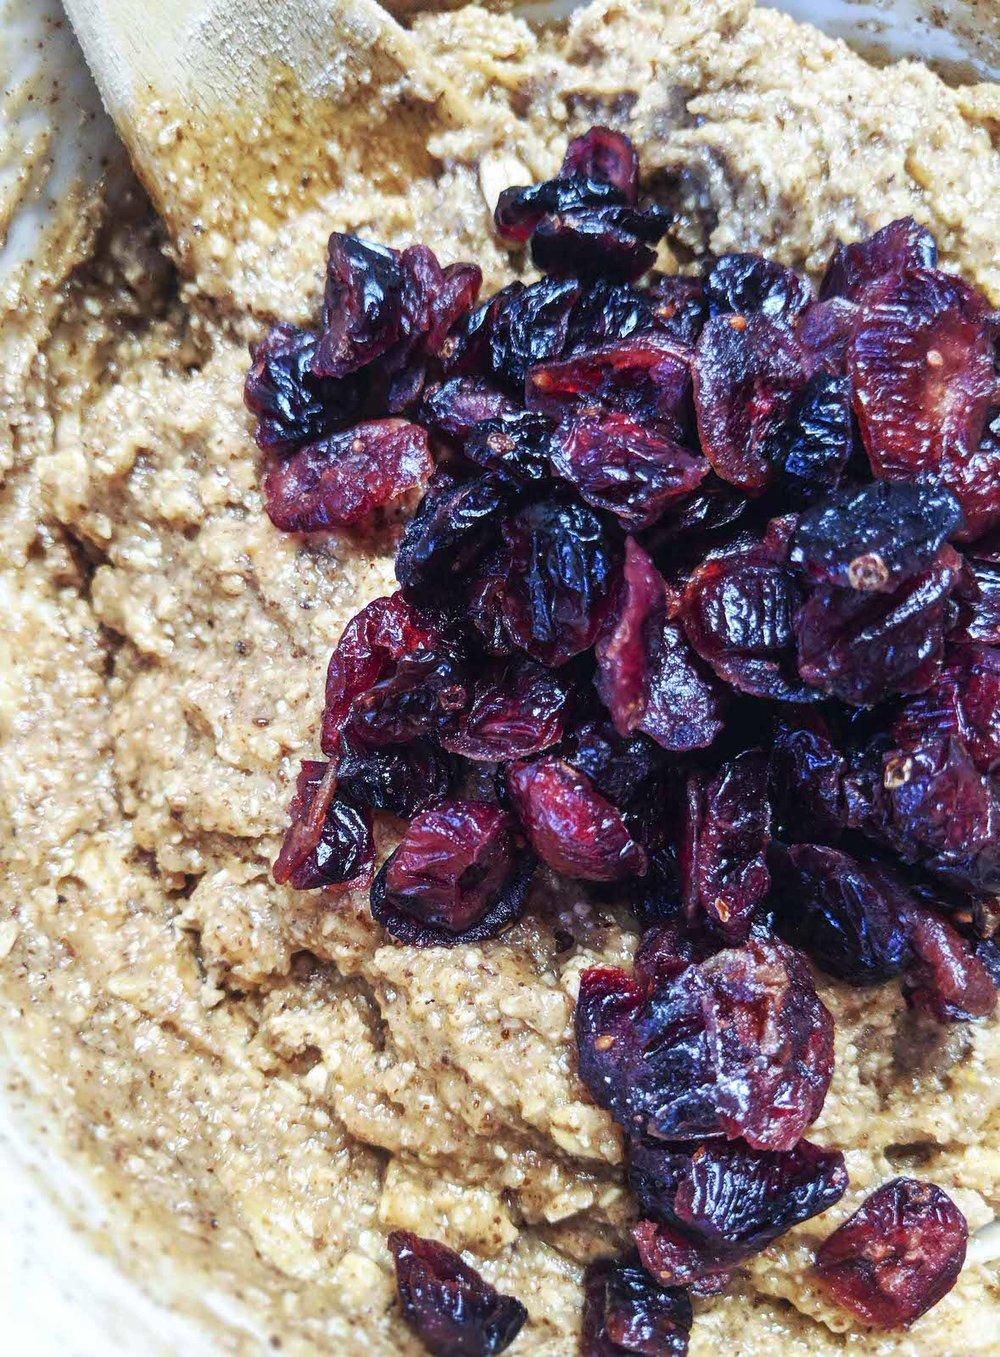 cranberry-oatmeal-cookie-dough-vegan-gluten-free.JPG